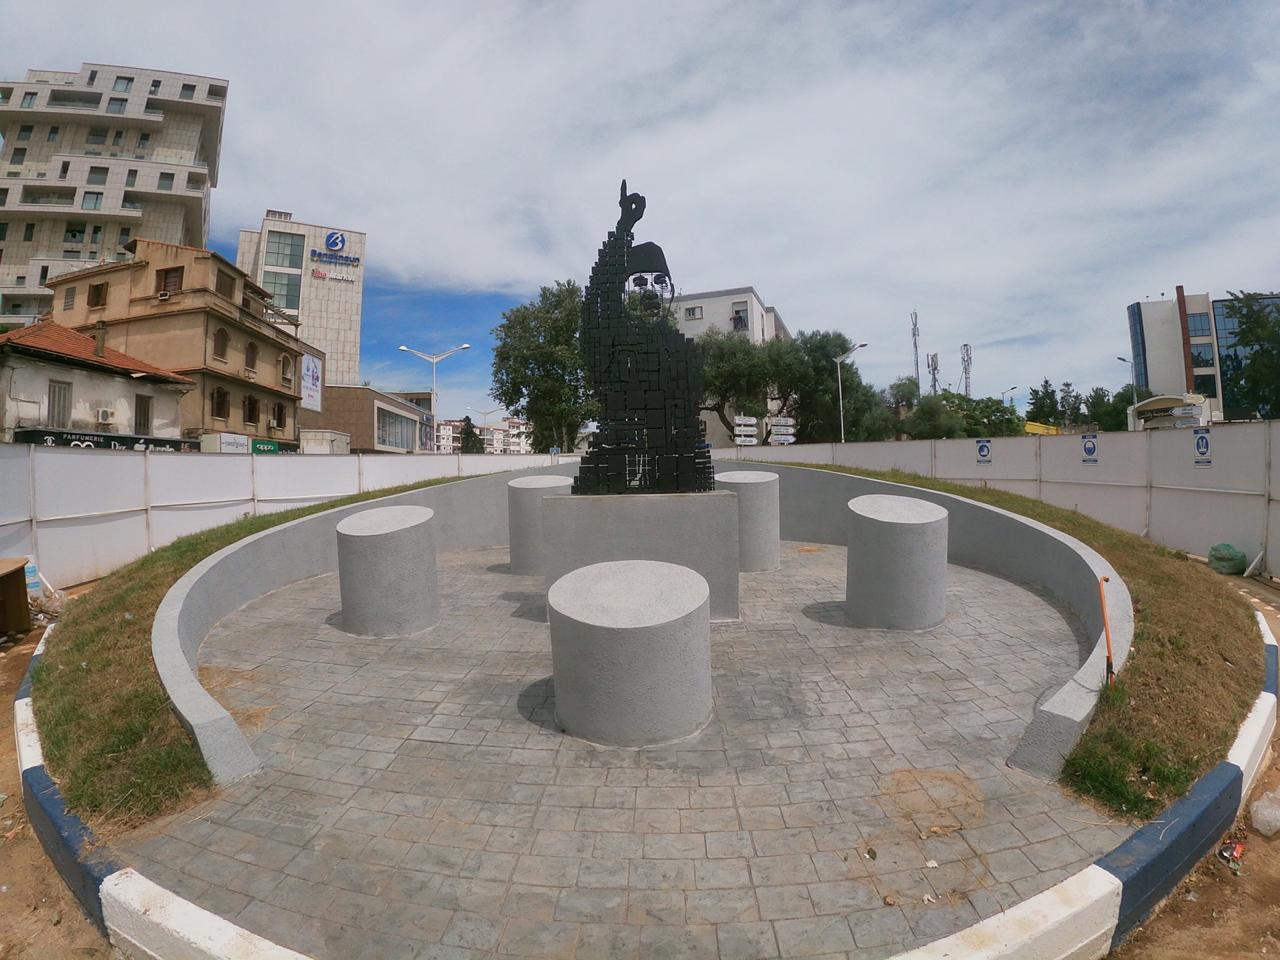 Sukarno monument to grace Algiers' city center